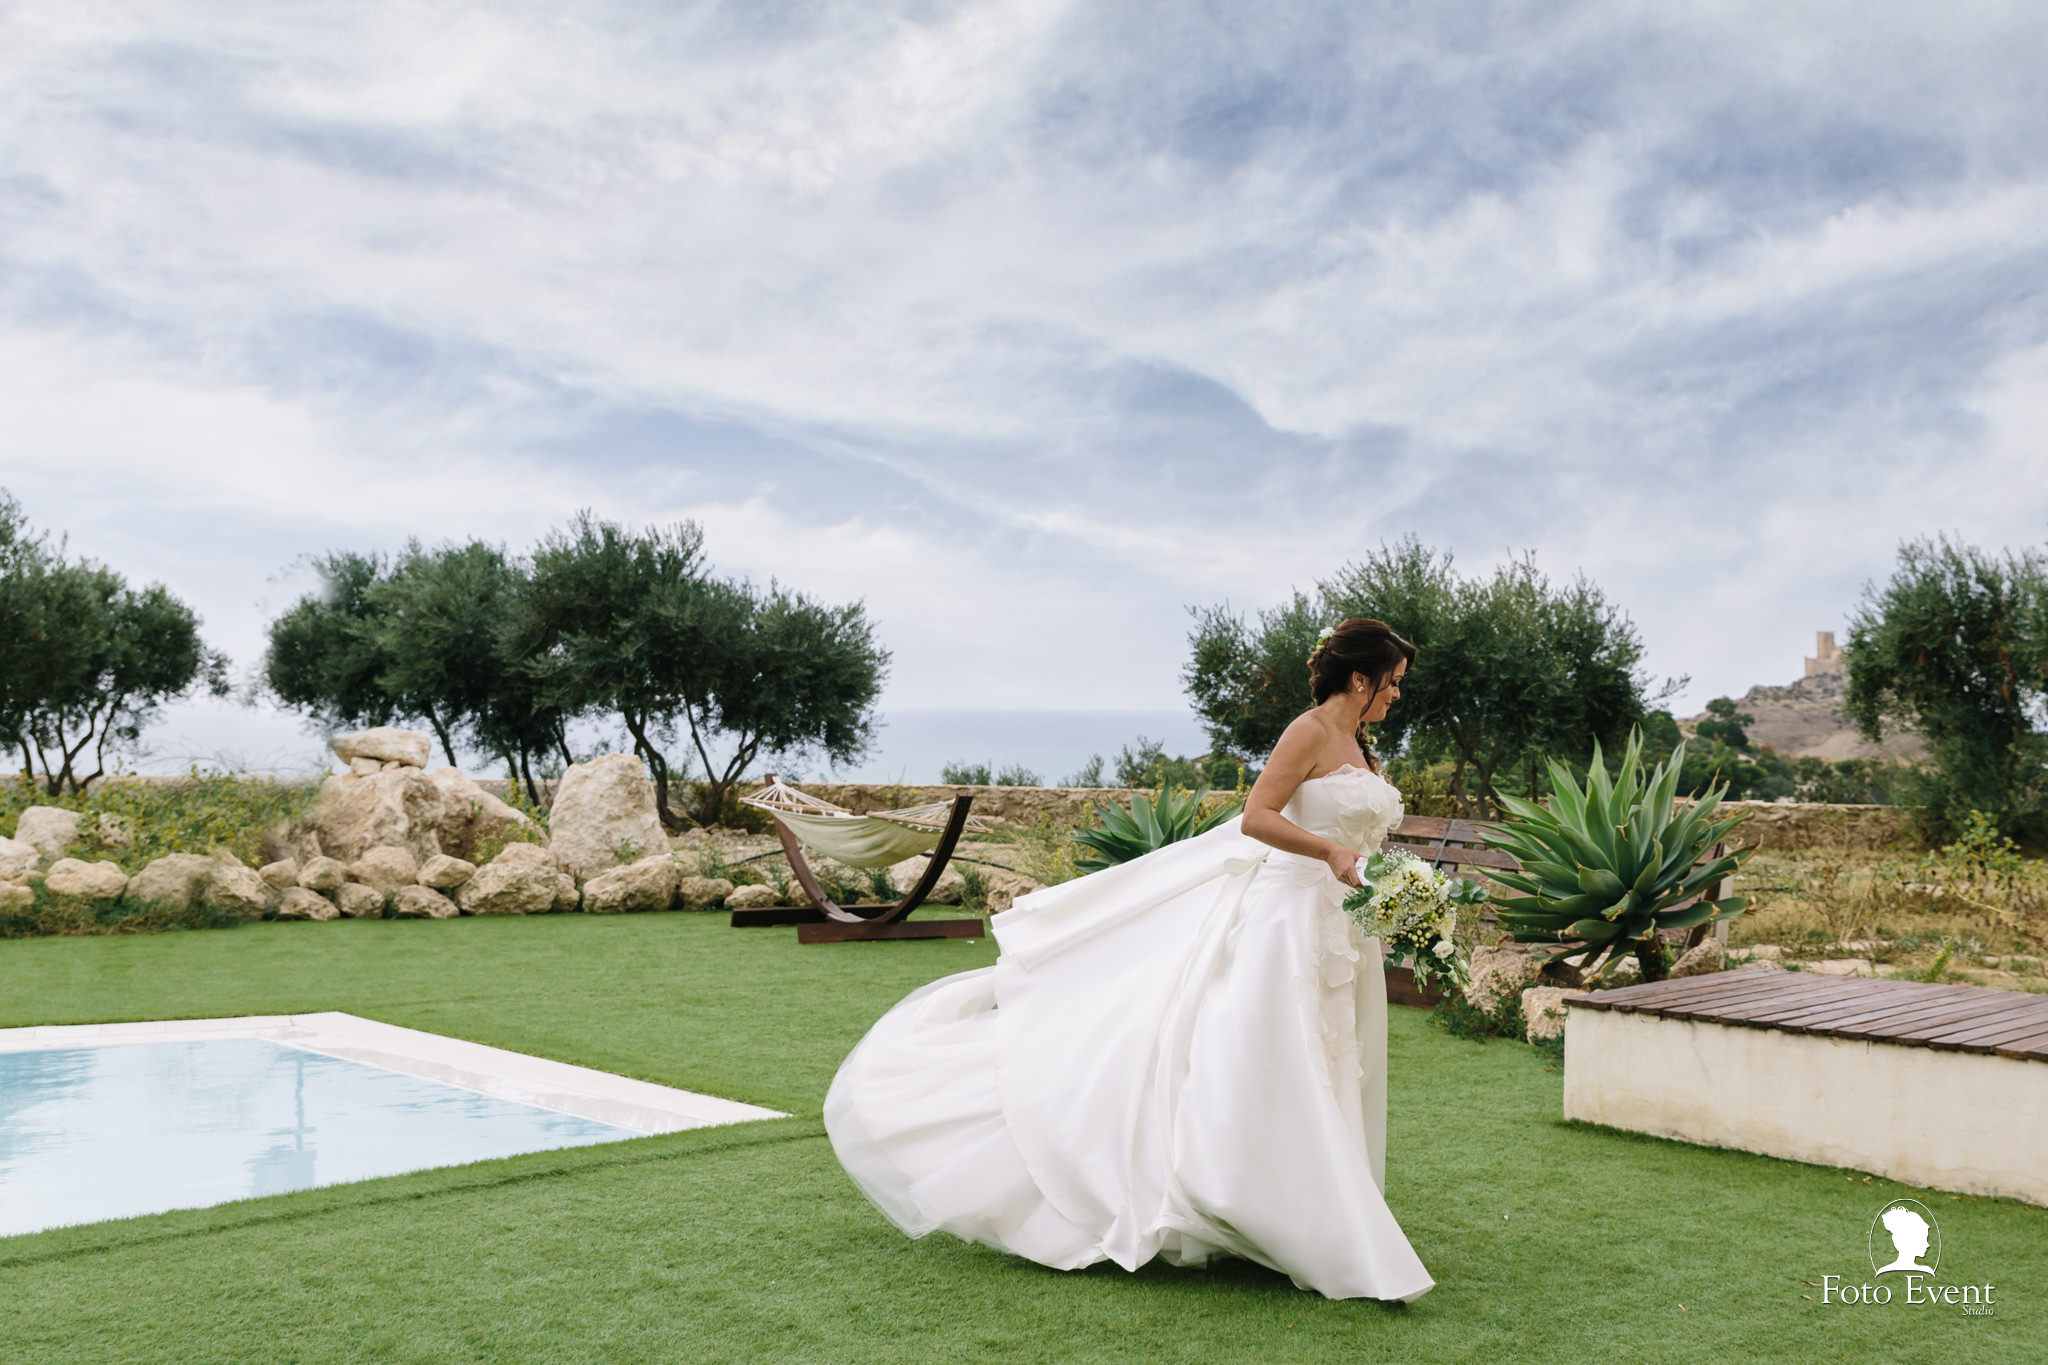 029-2020-10-15-Matrimonio-Noemi-e-Salvatore-Paterno-5DE-1072-Edit-Edit